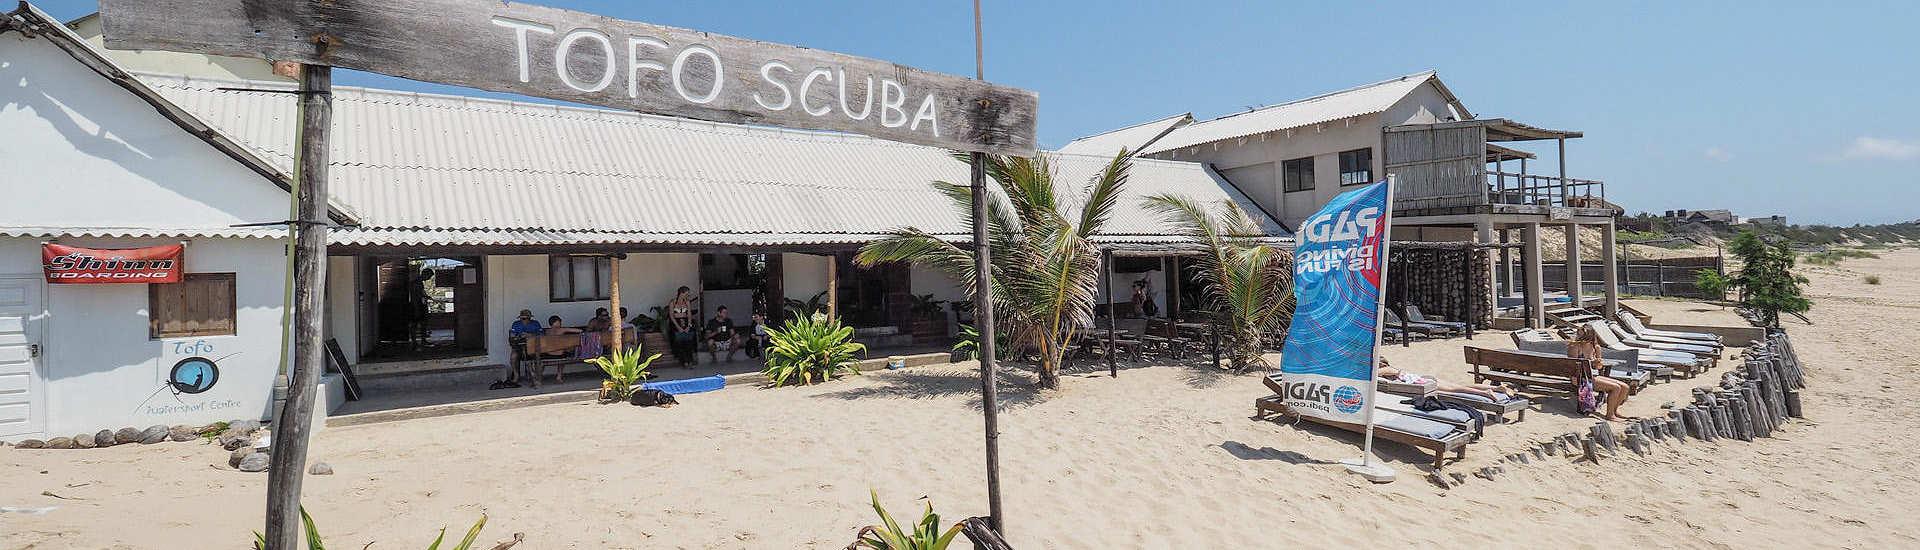 Tauchbasis Tofo Scuba in Mosambik